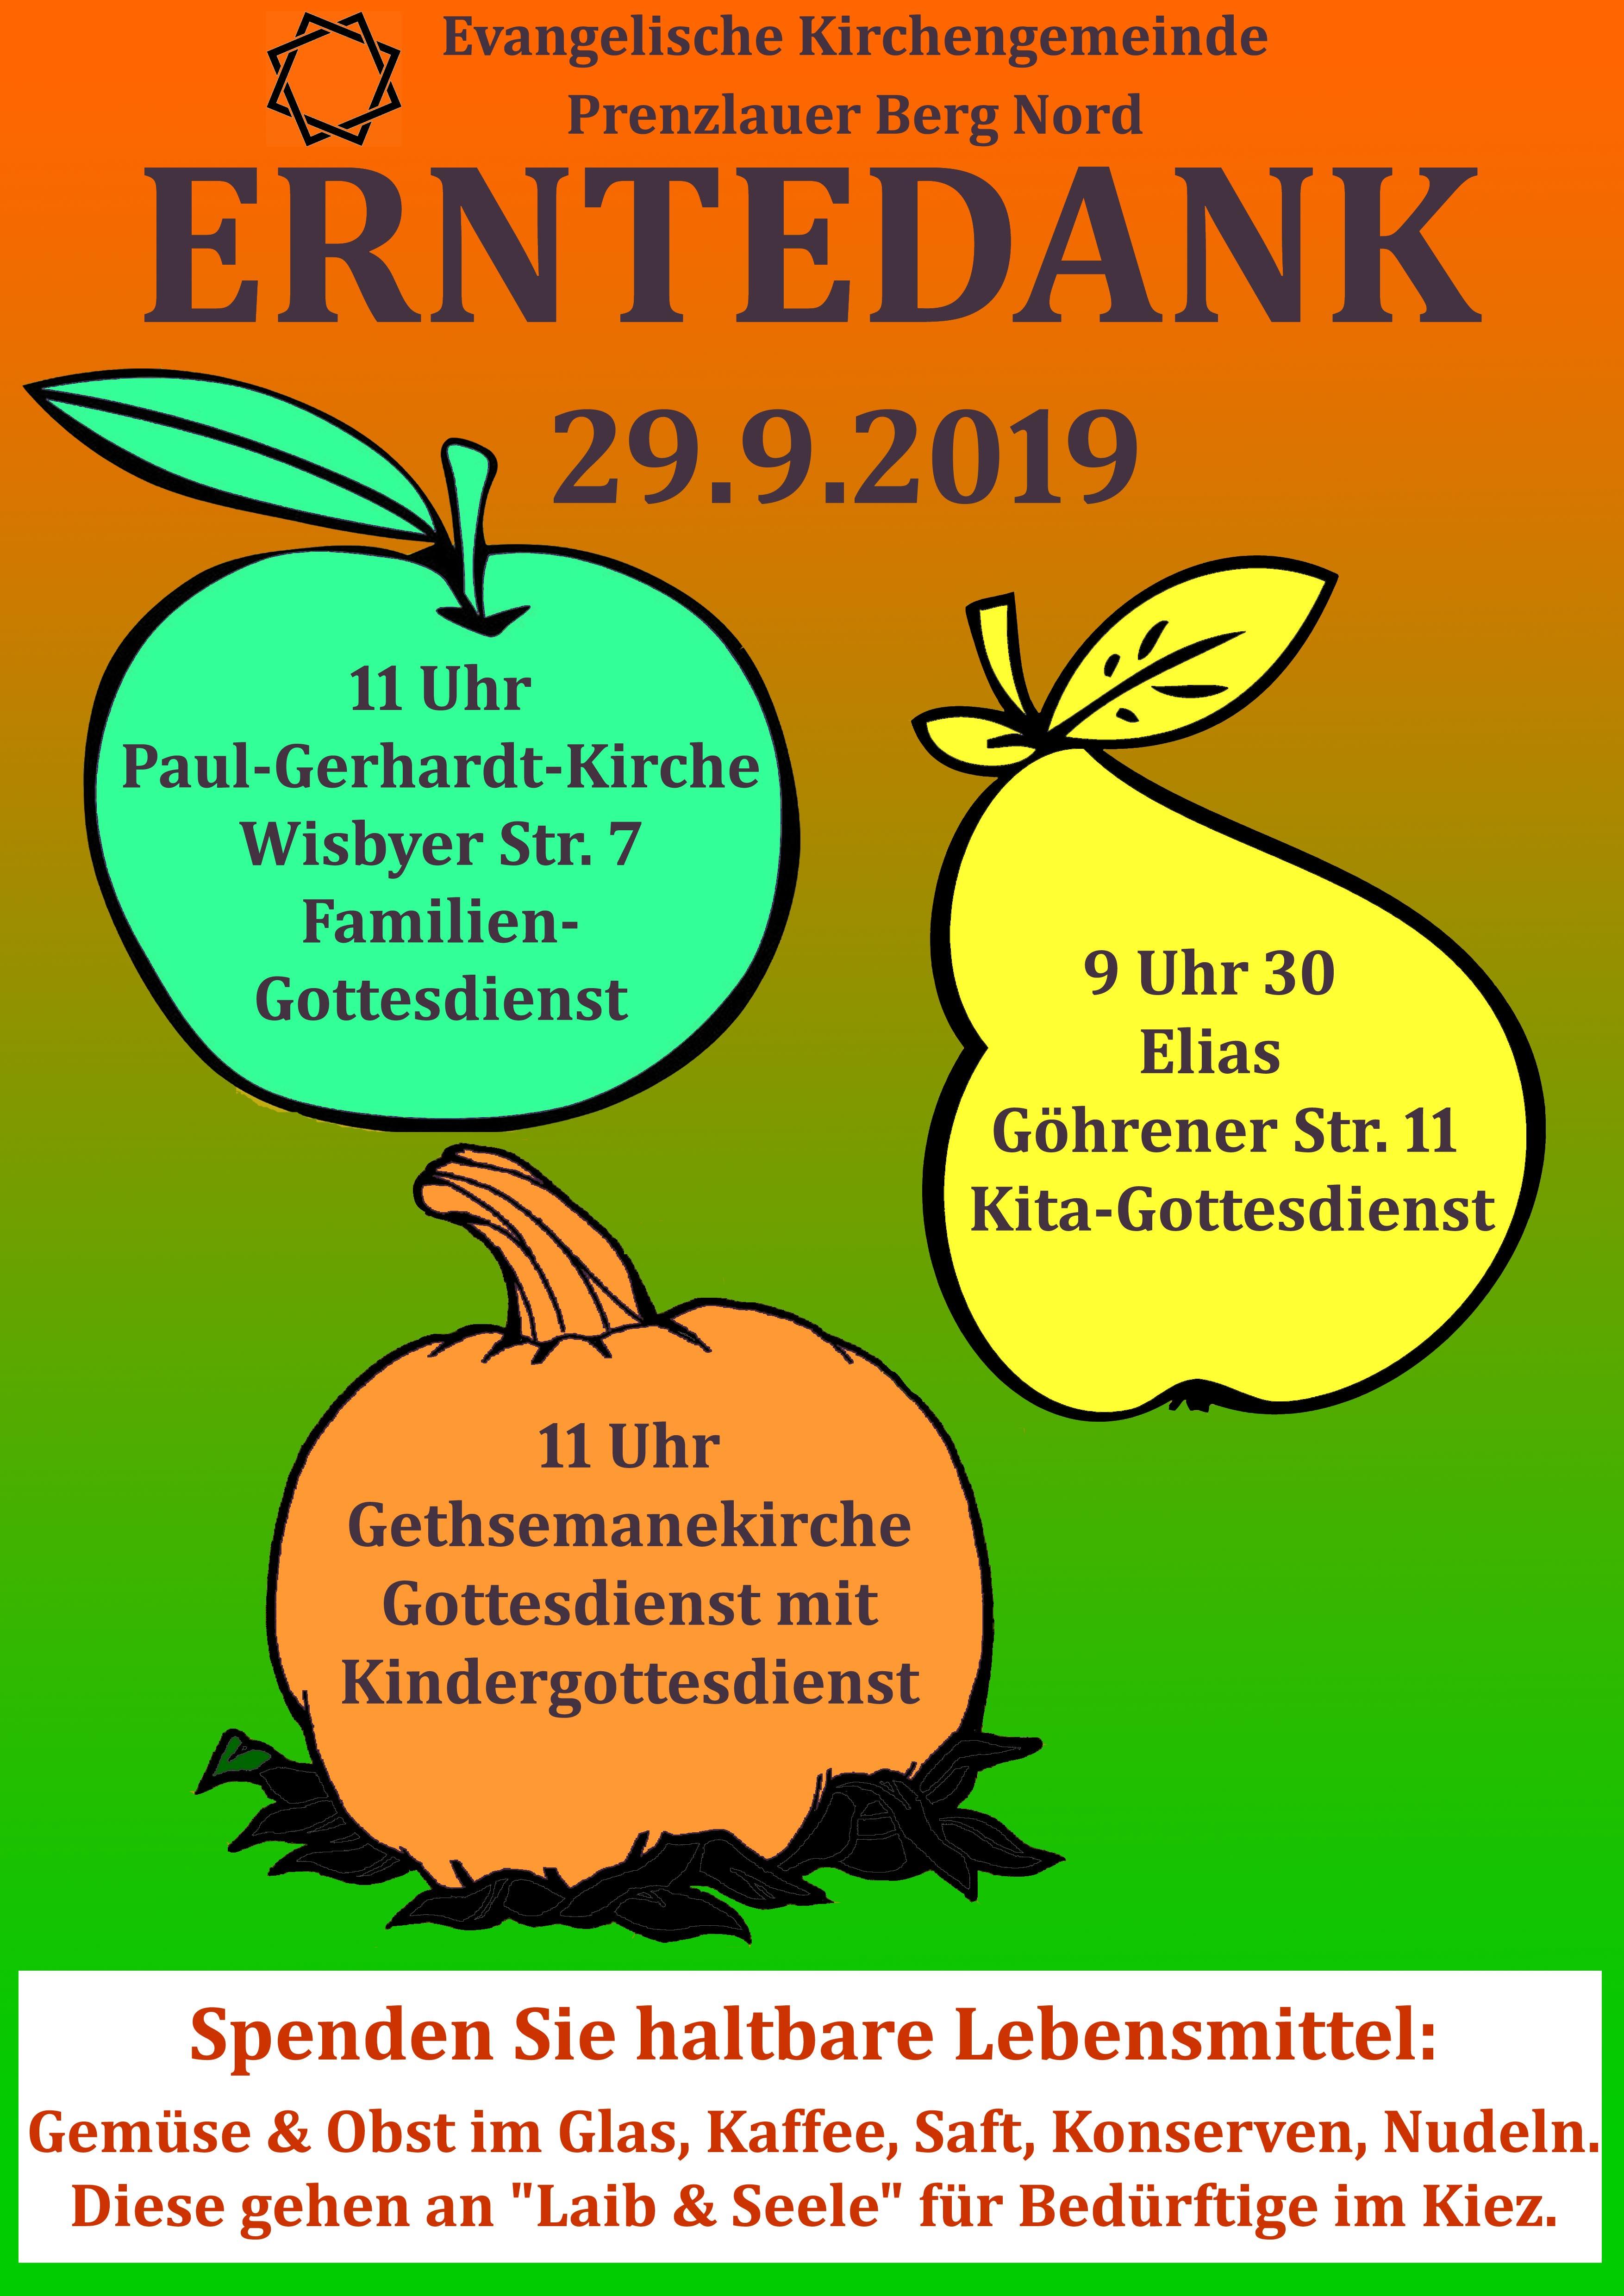 Erntedank am 29. September in Prenzlauer Berg Nord